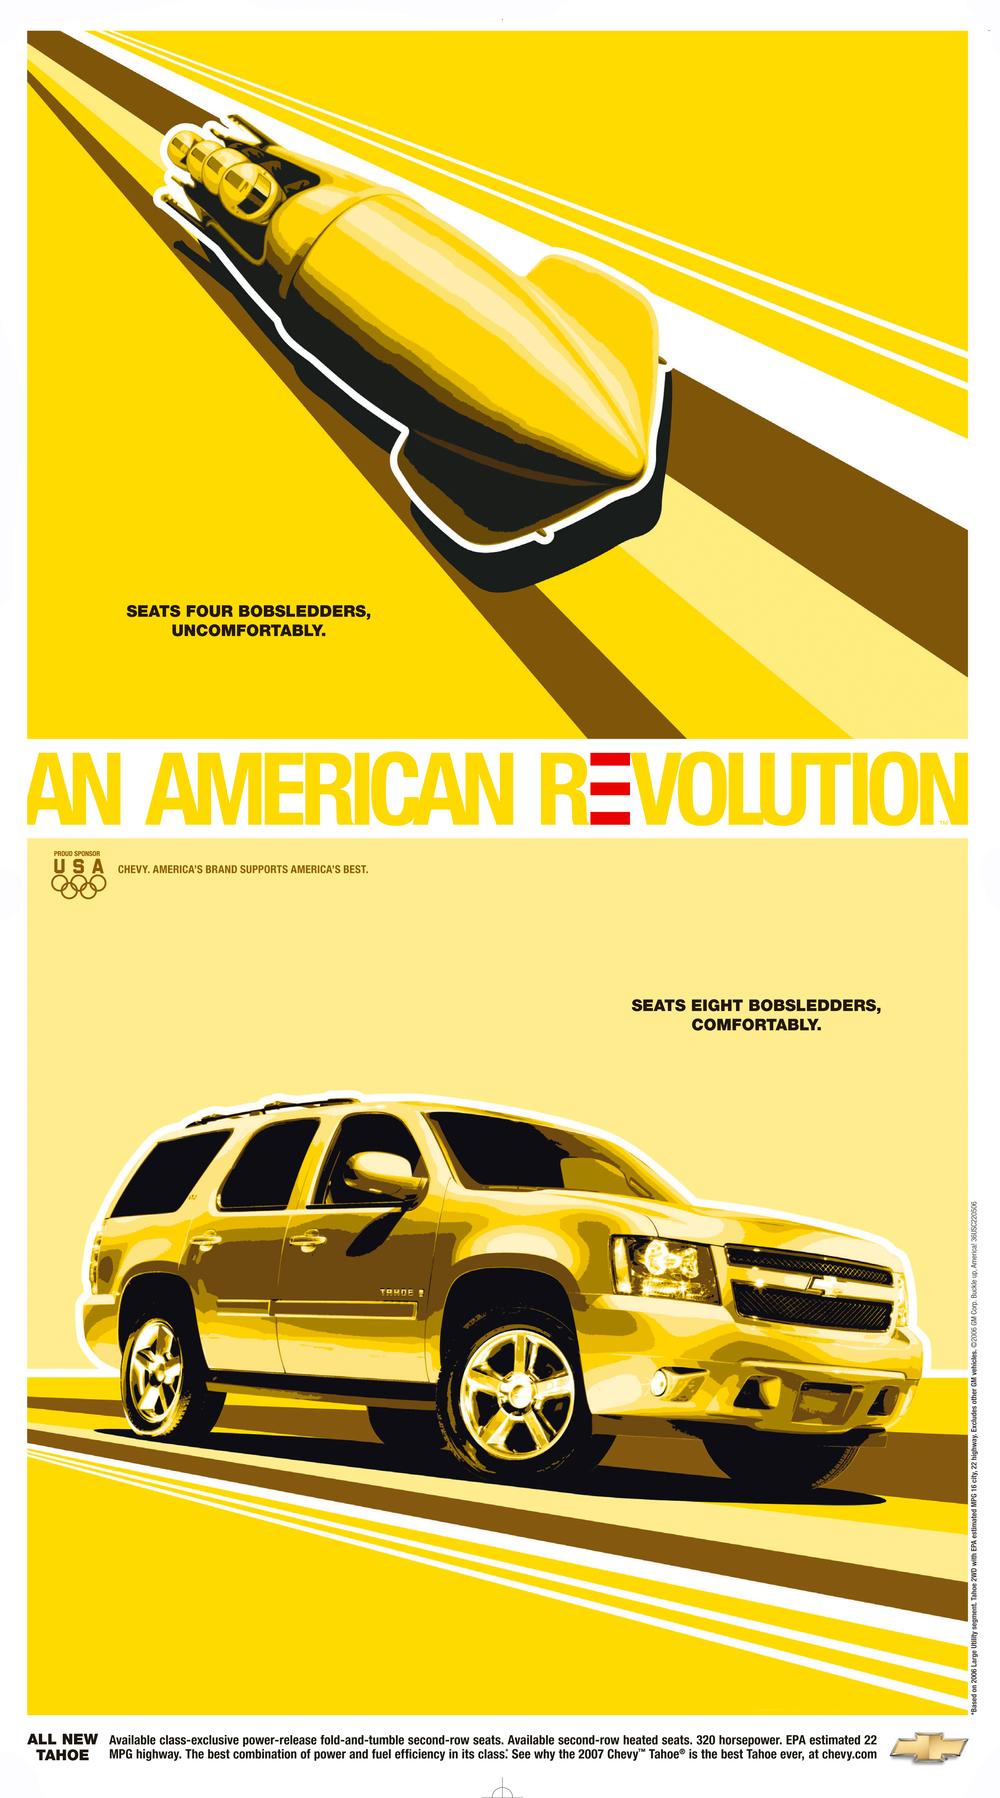 olympic_yellow.jpg